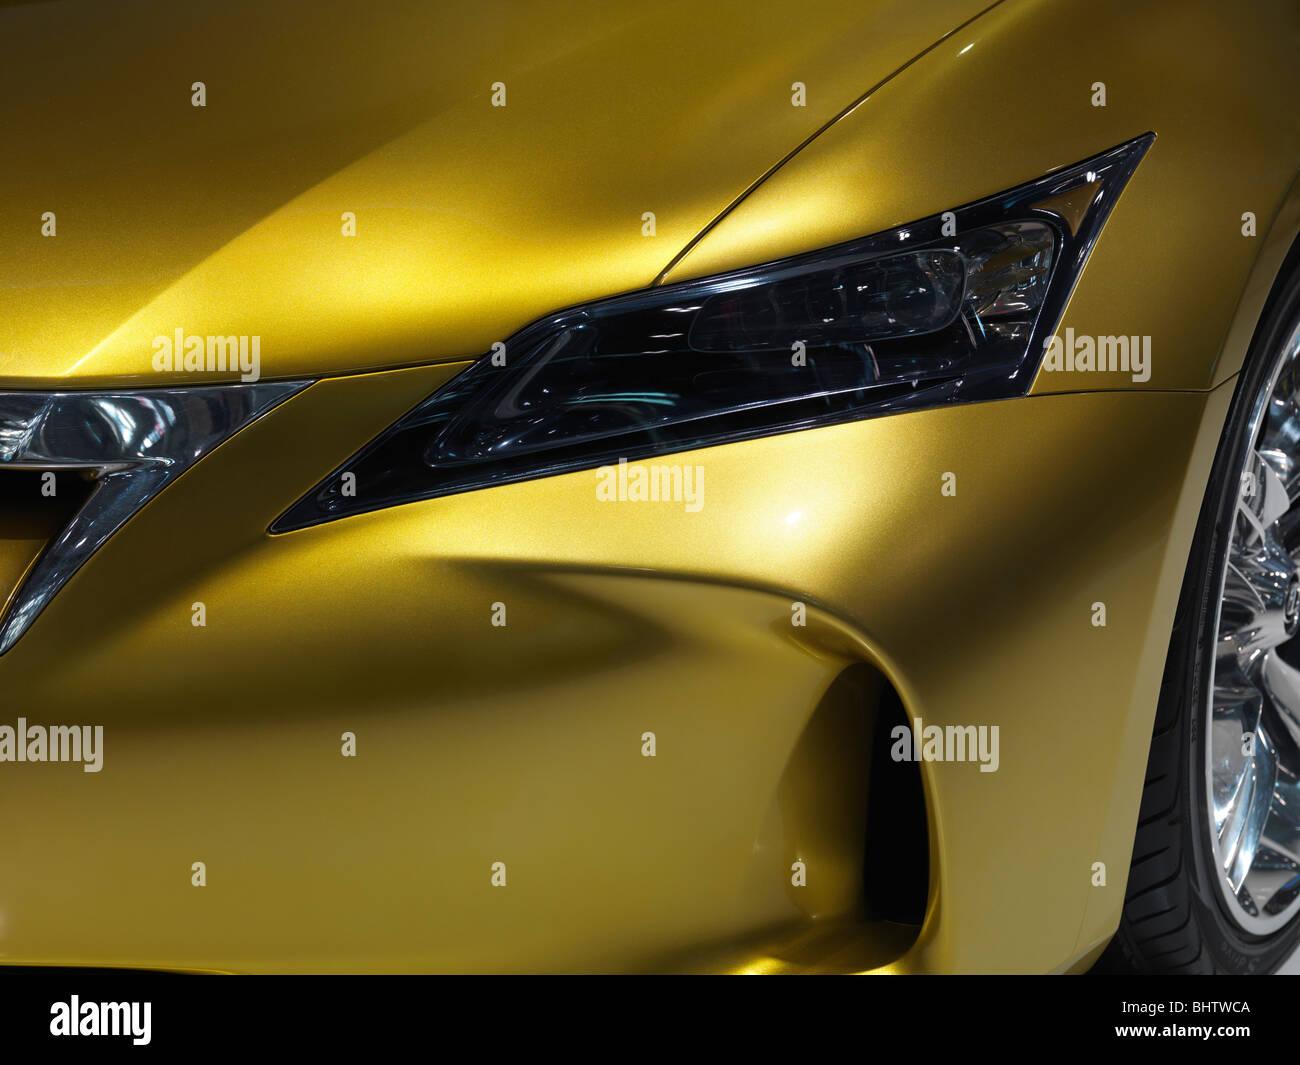 Closeup of exotic gold shiny car Lexus LF-Ch hybrid concept car - Stock Image